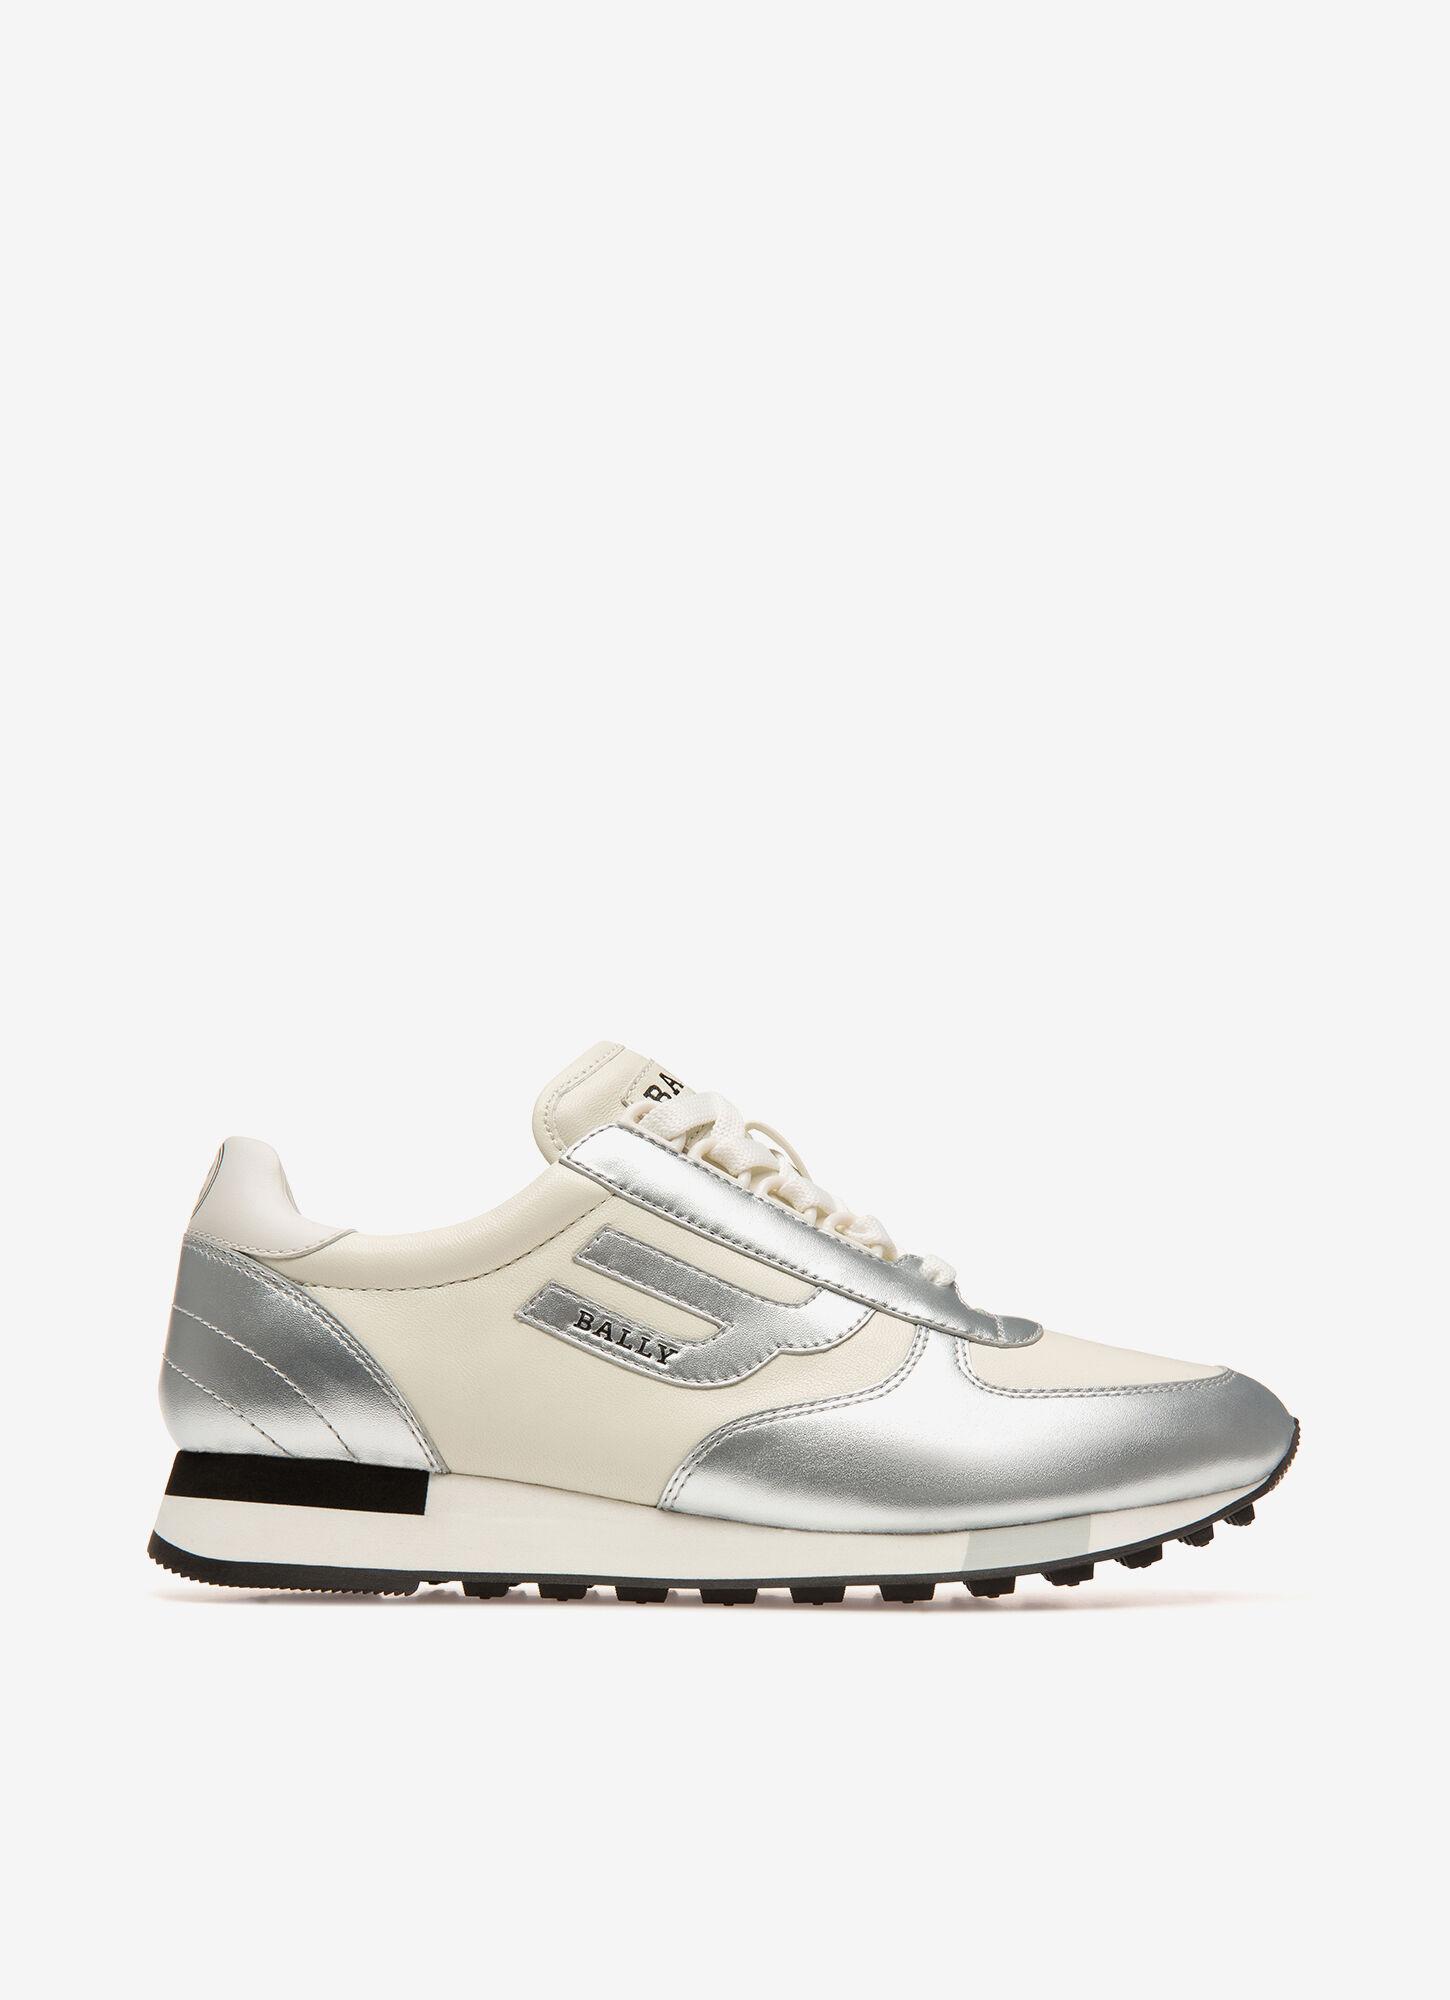 Gavinia| Womens Sneakers | Silver